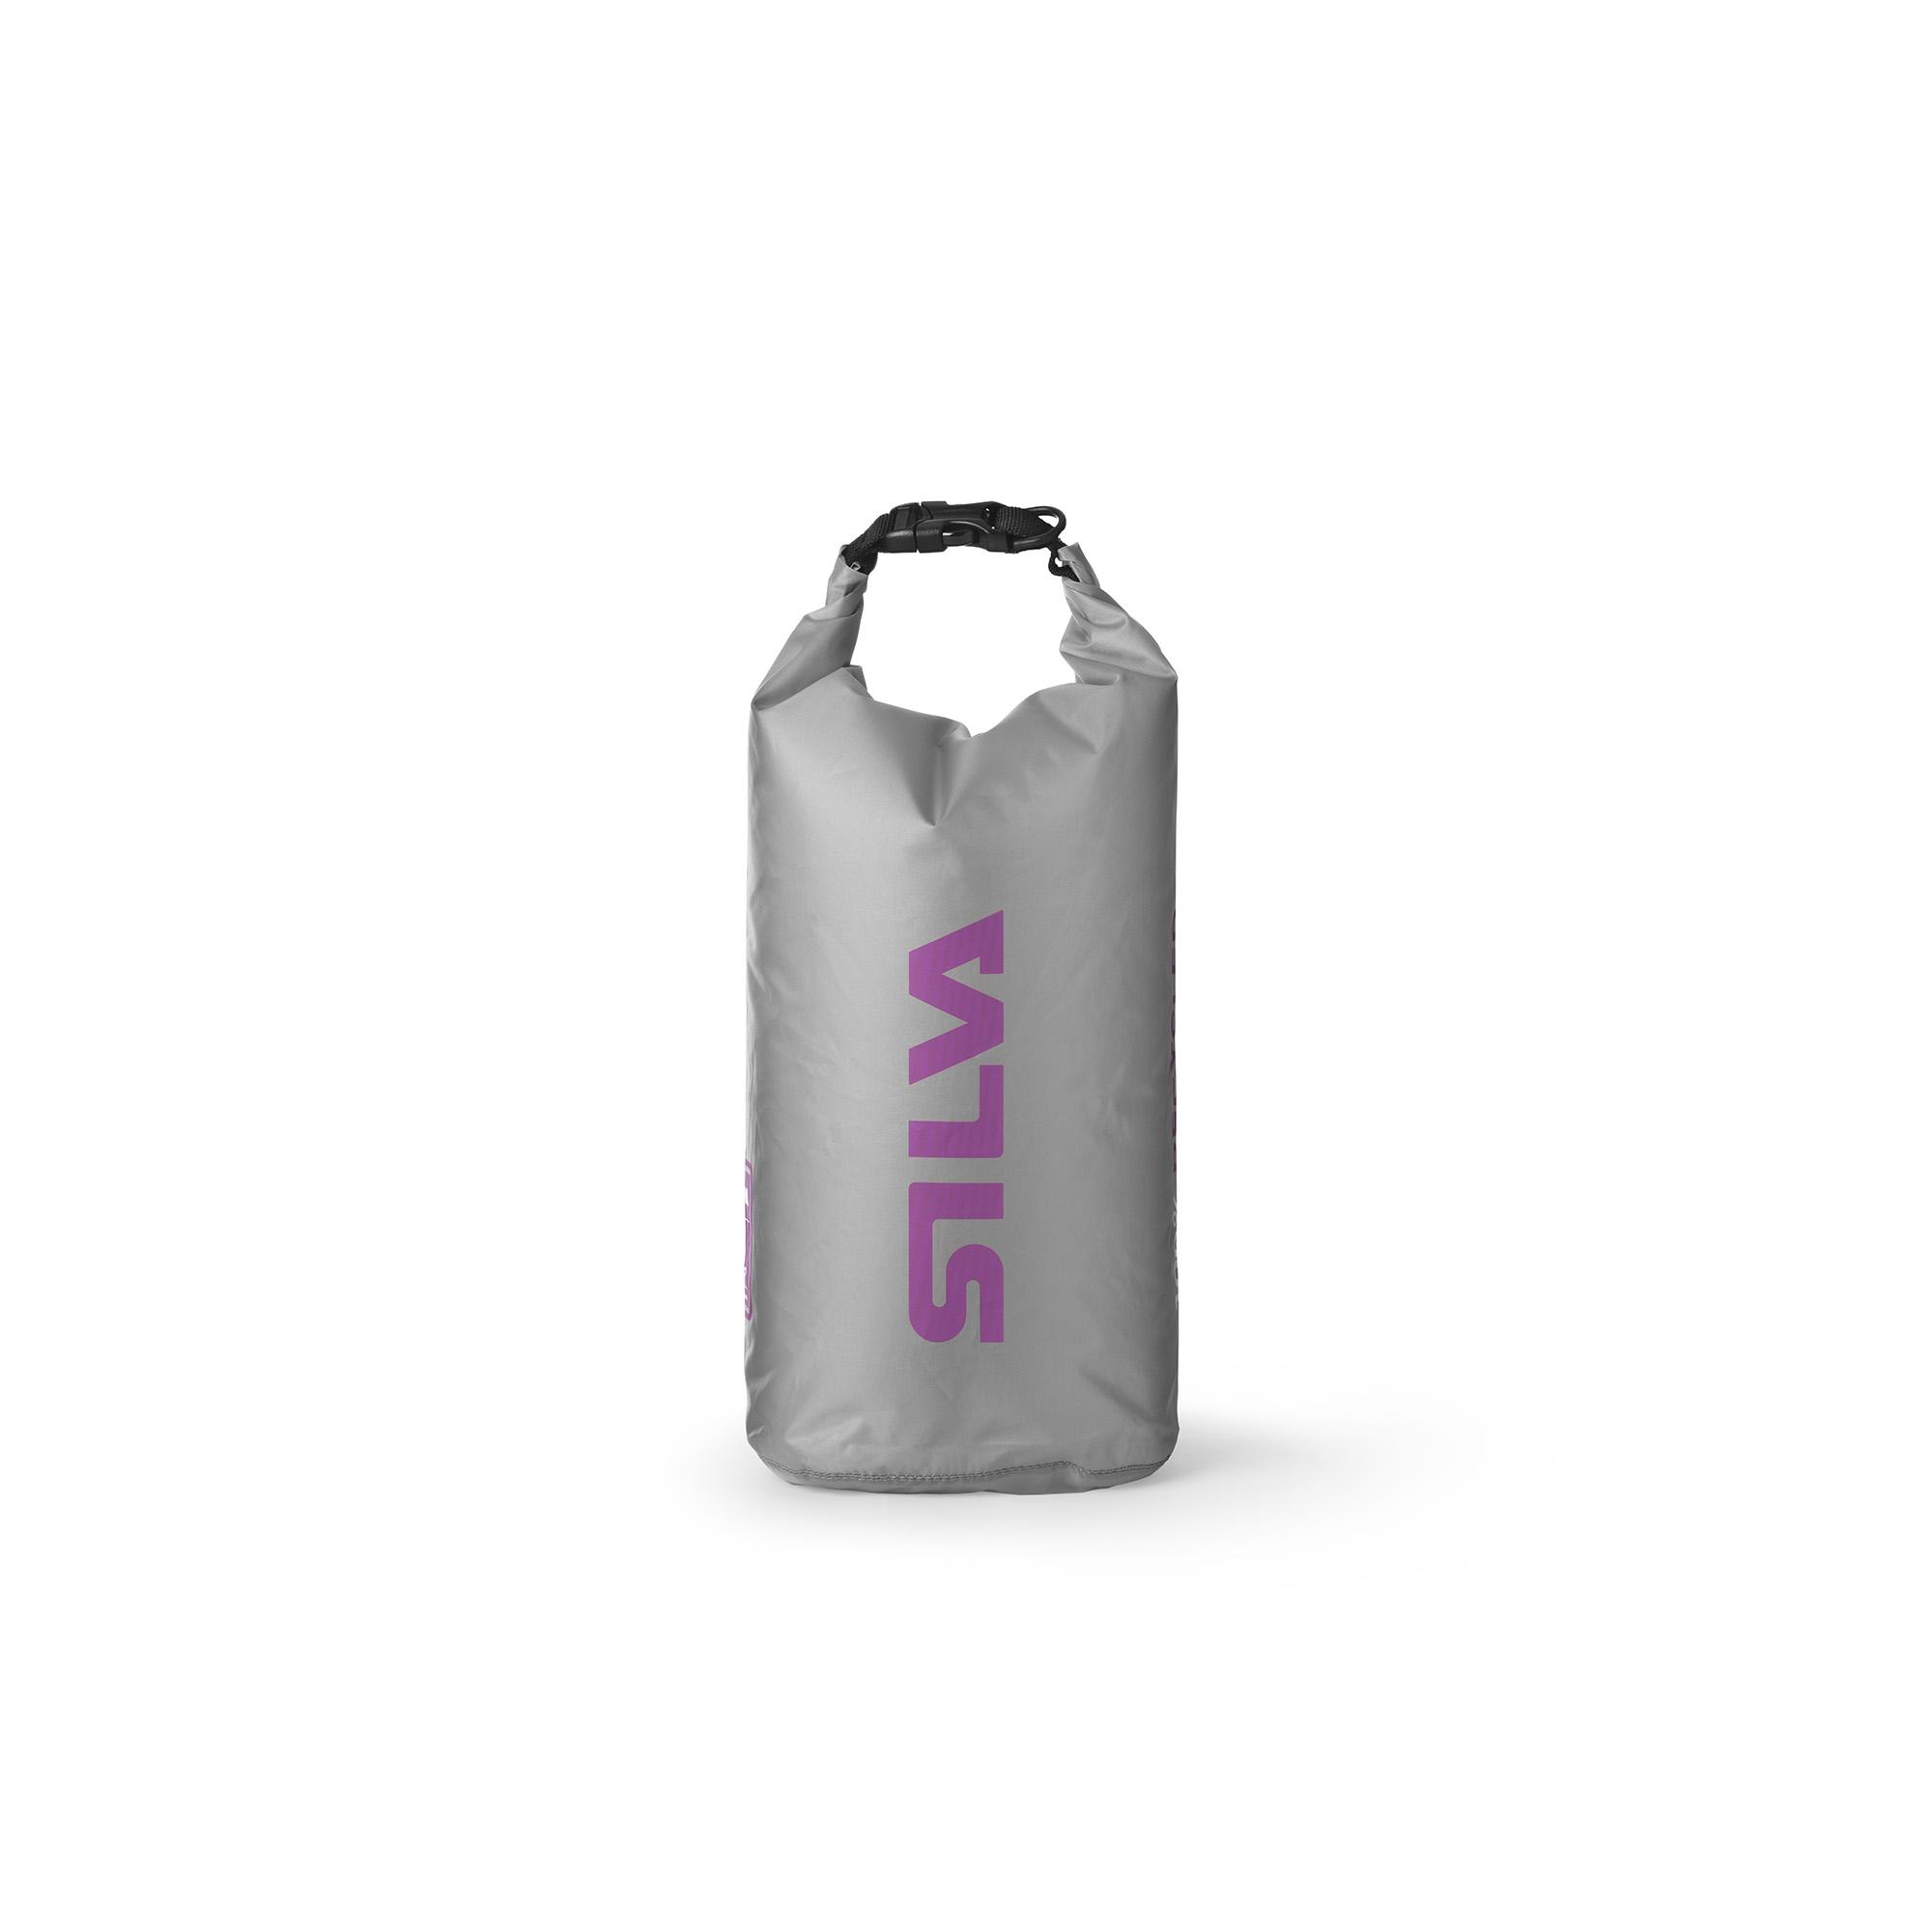 dry-bag-r-pet_100-recycled_6l